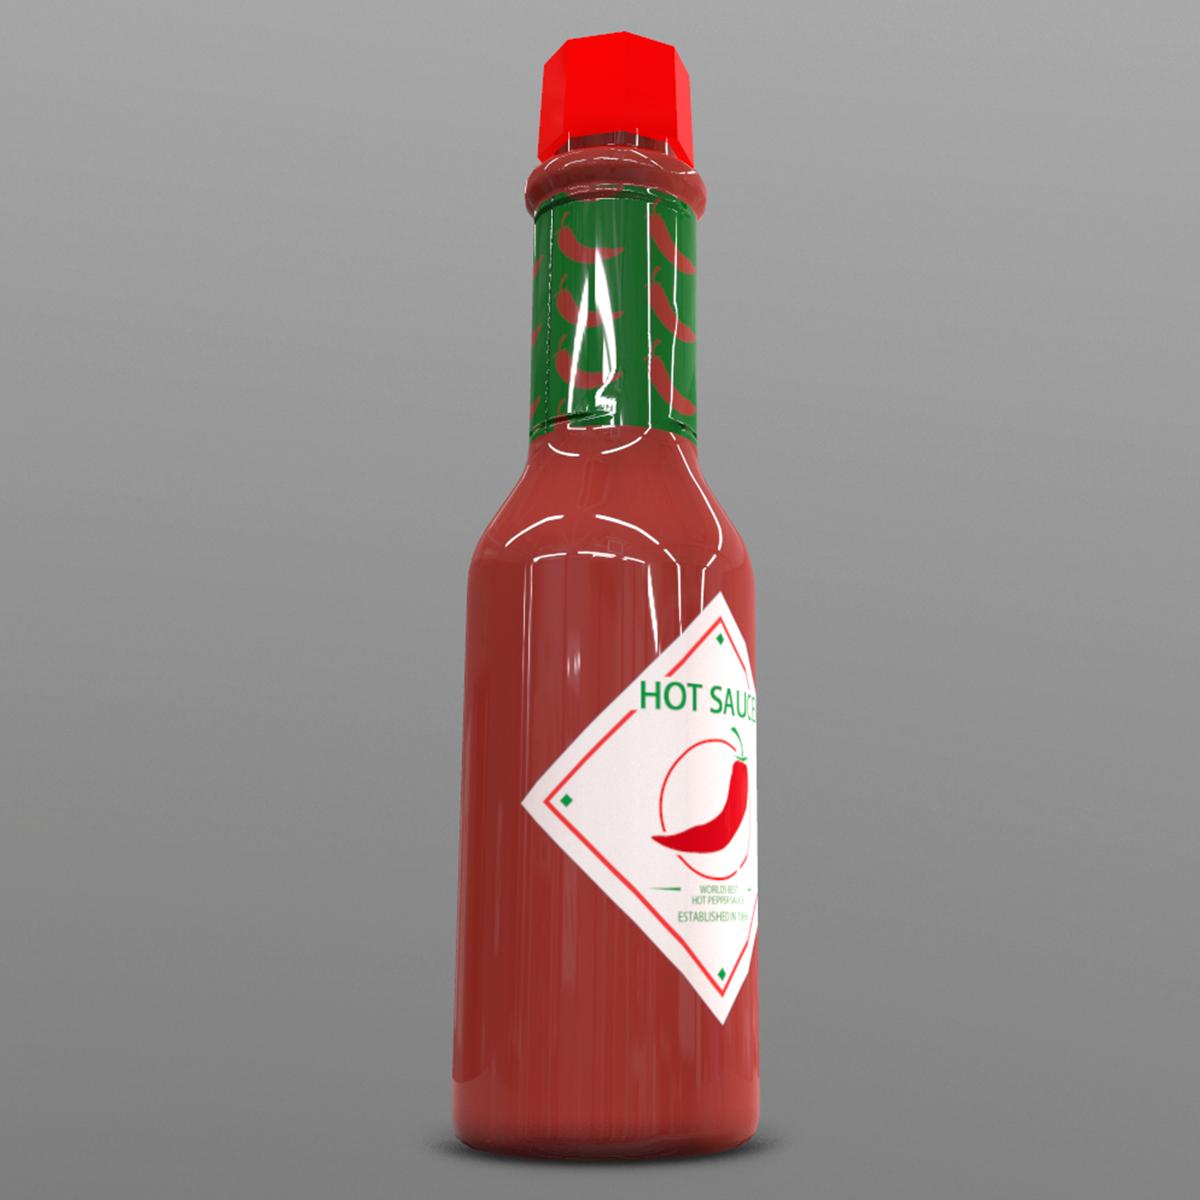 Hot Sauce Bottle Hot Sauce Bottles Hot Sauce